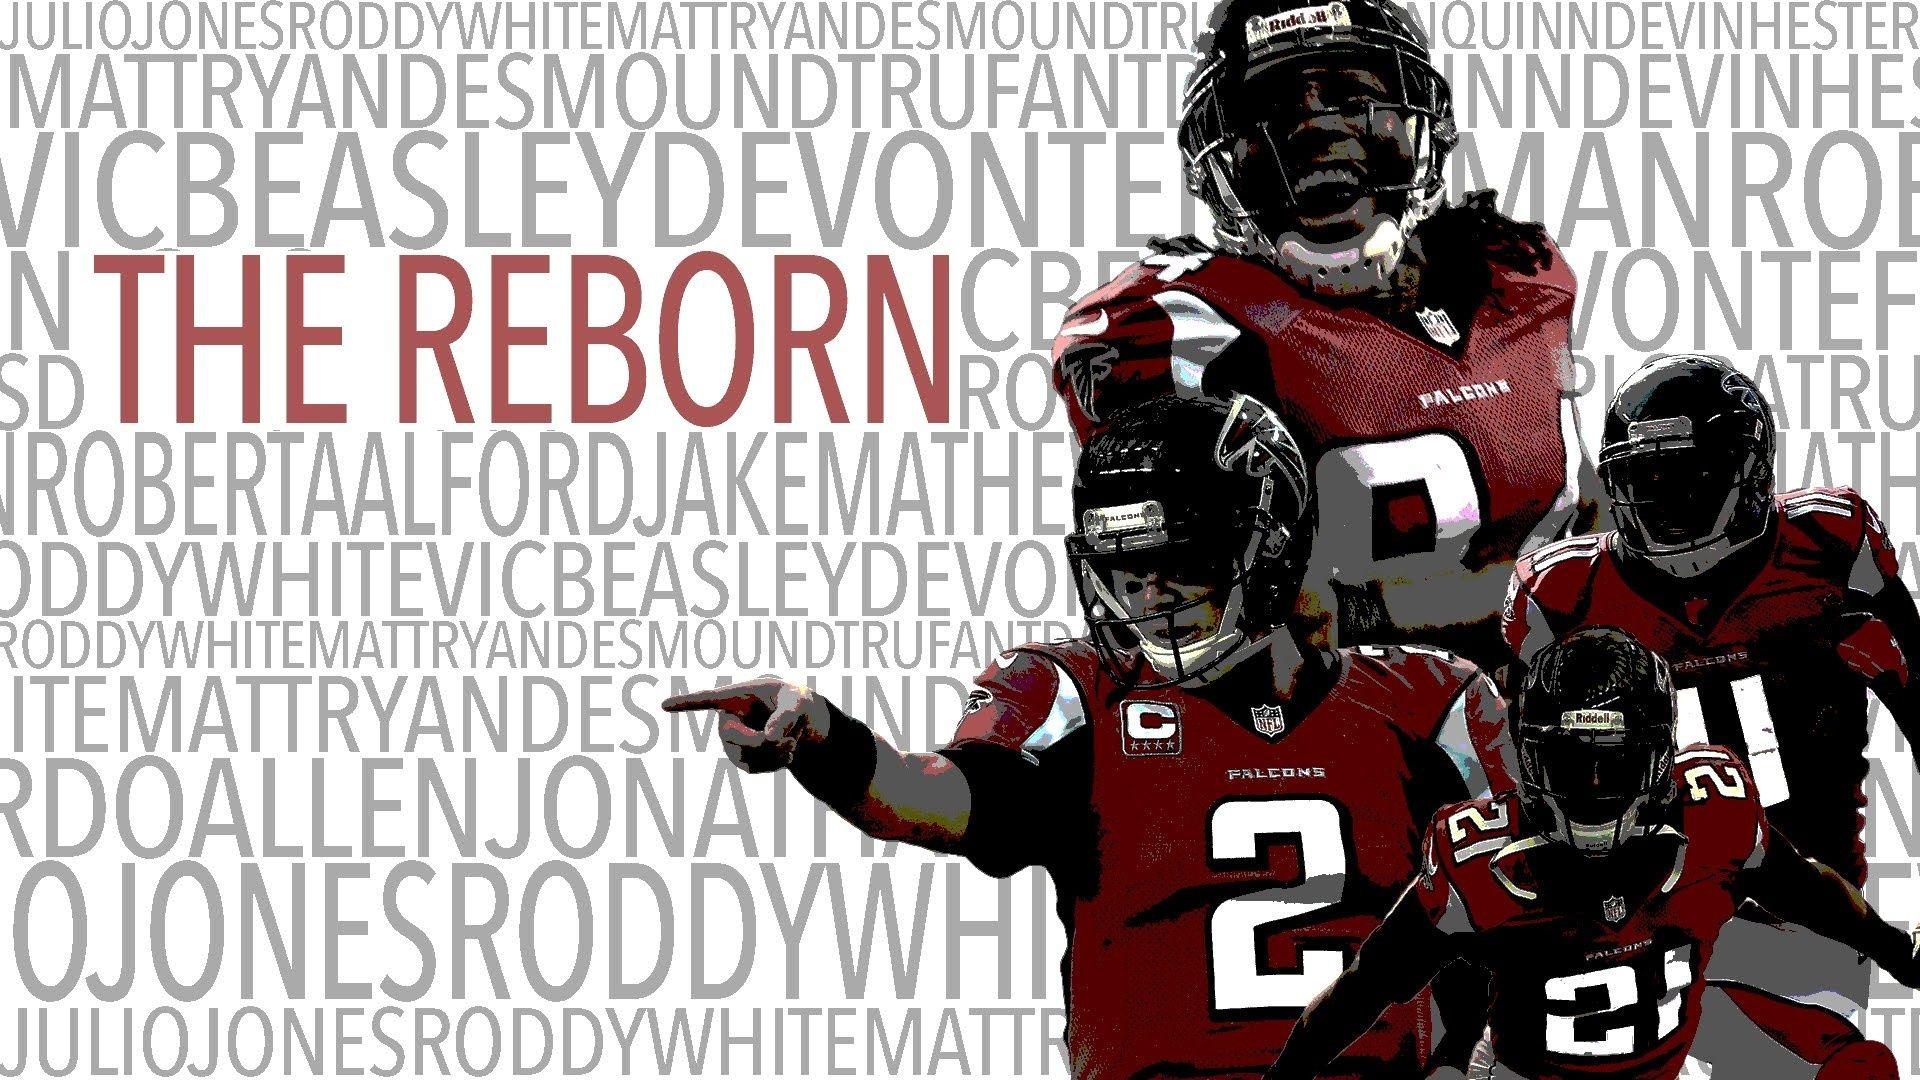 Atlanta Falcons download wallpaper image